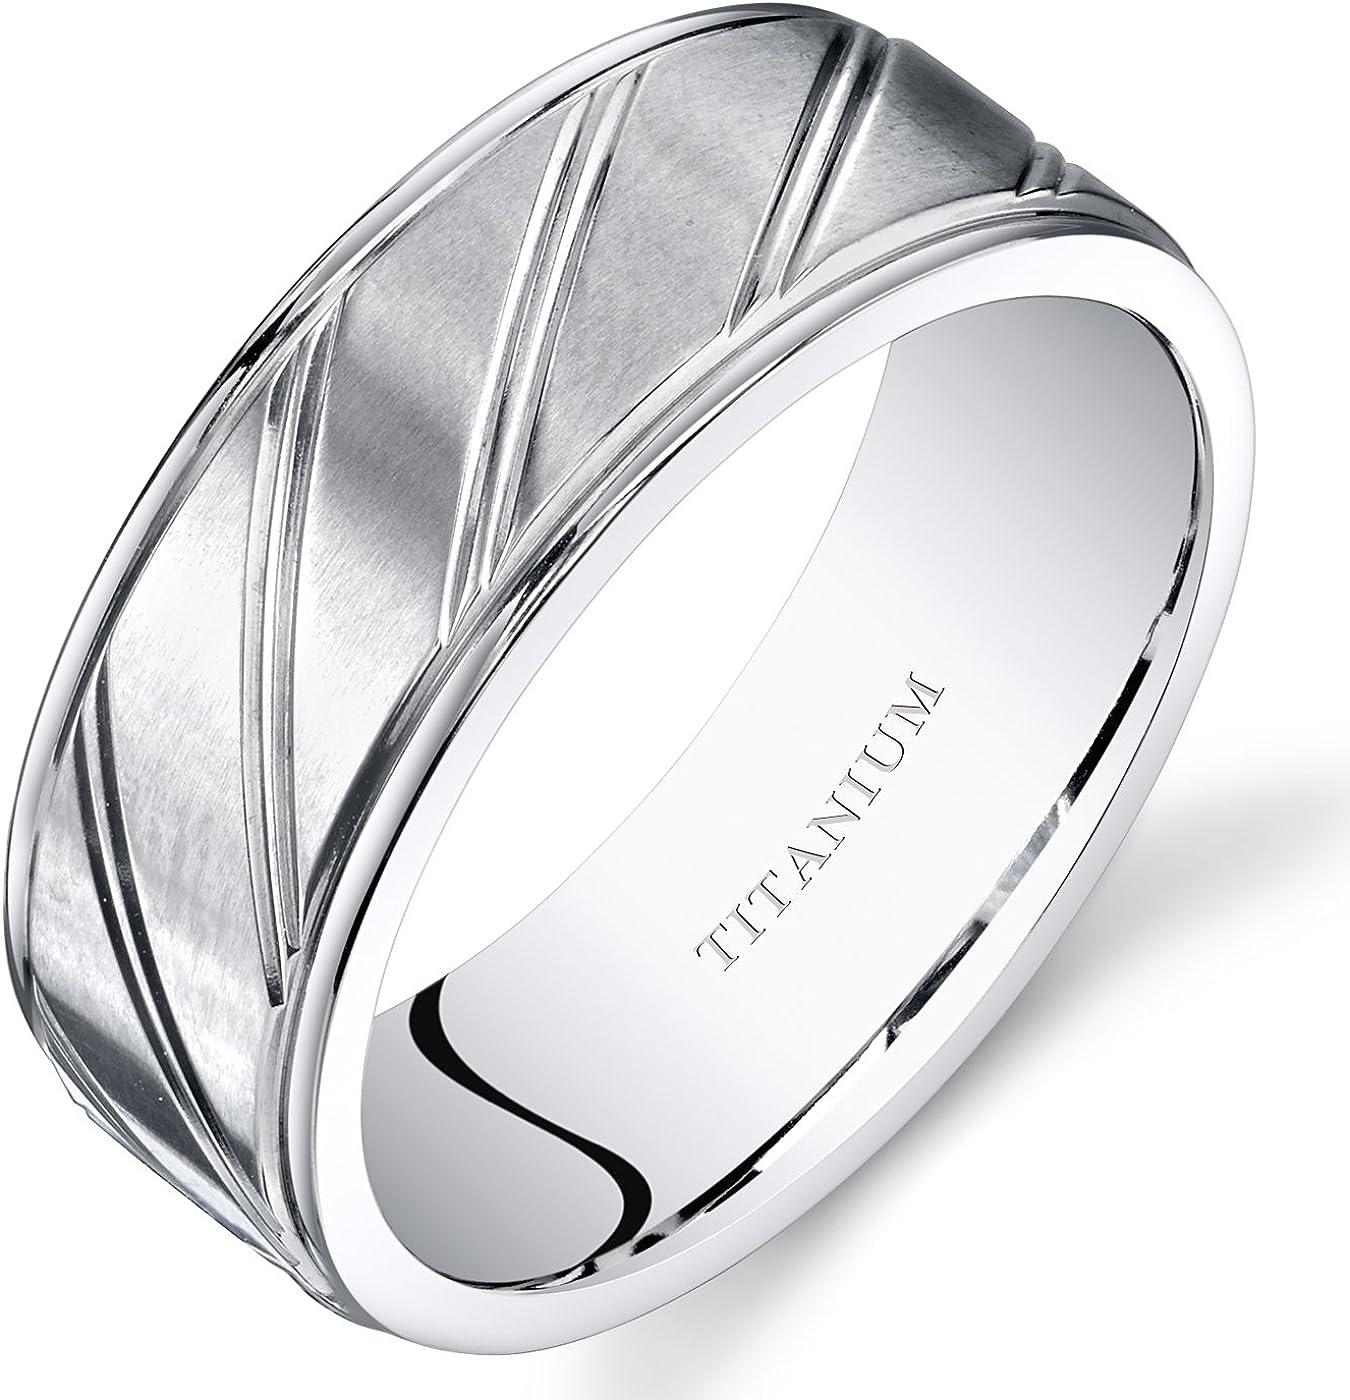 Peora Mens Titanium Wedding Band Ring 8mm Matte Finish Diagonal Grooves Sizes 7-14